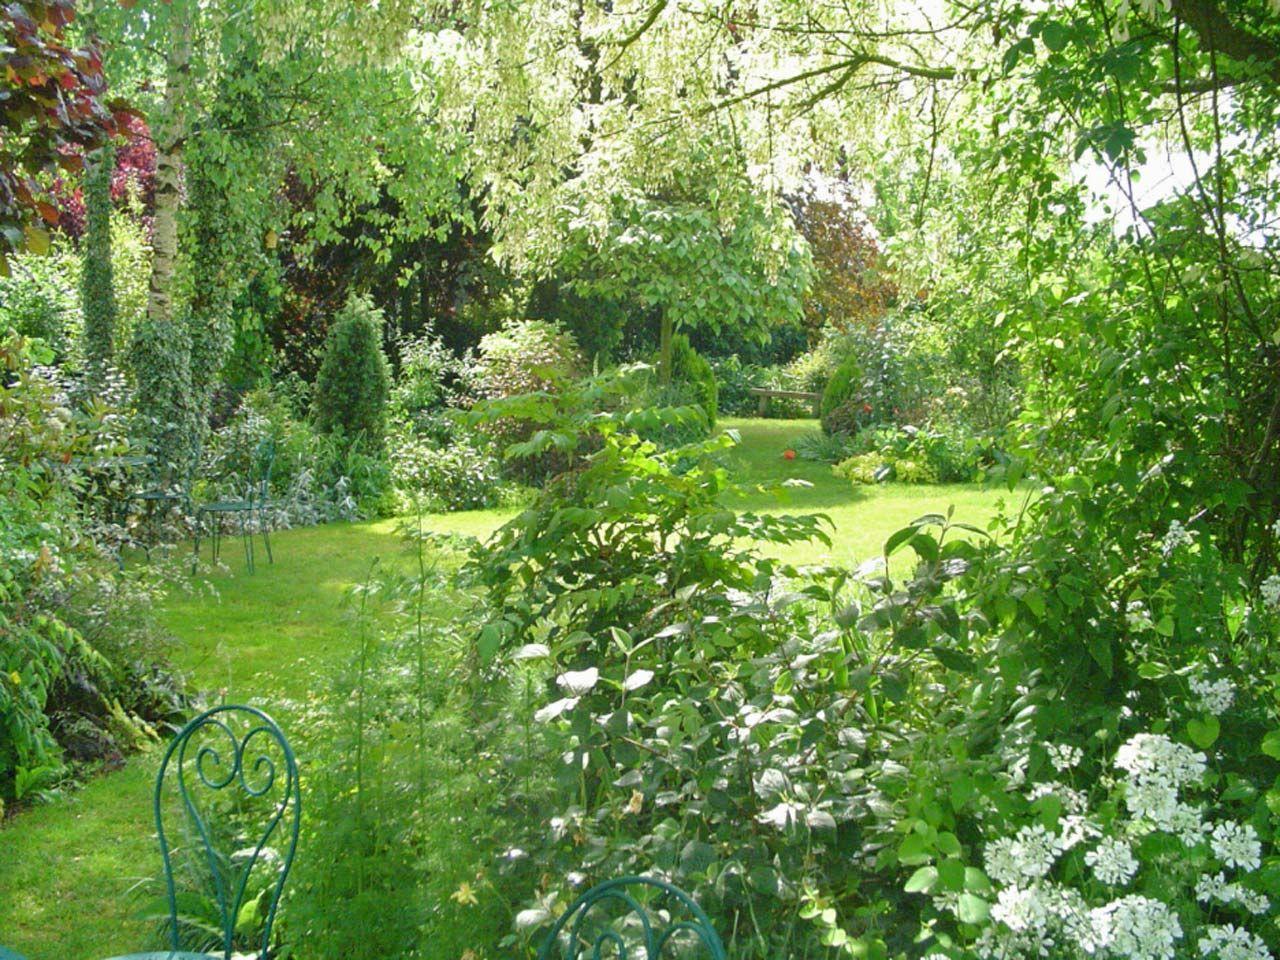 Jardin de bussy lorraine tourisme for Haie jardin anglais